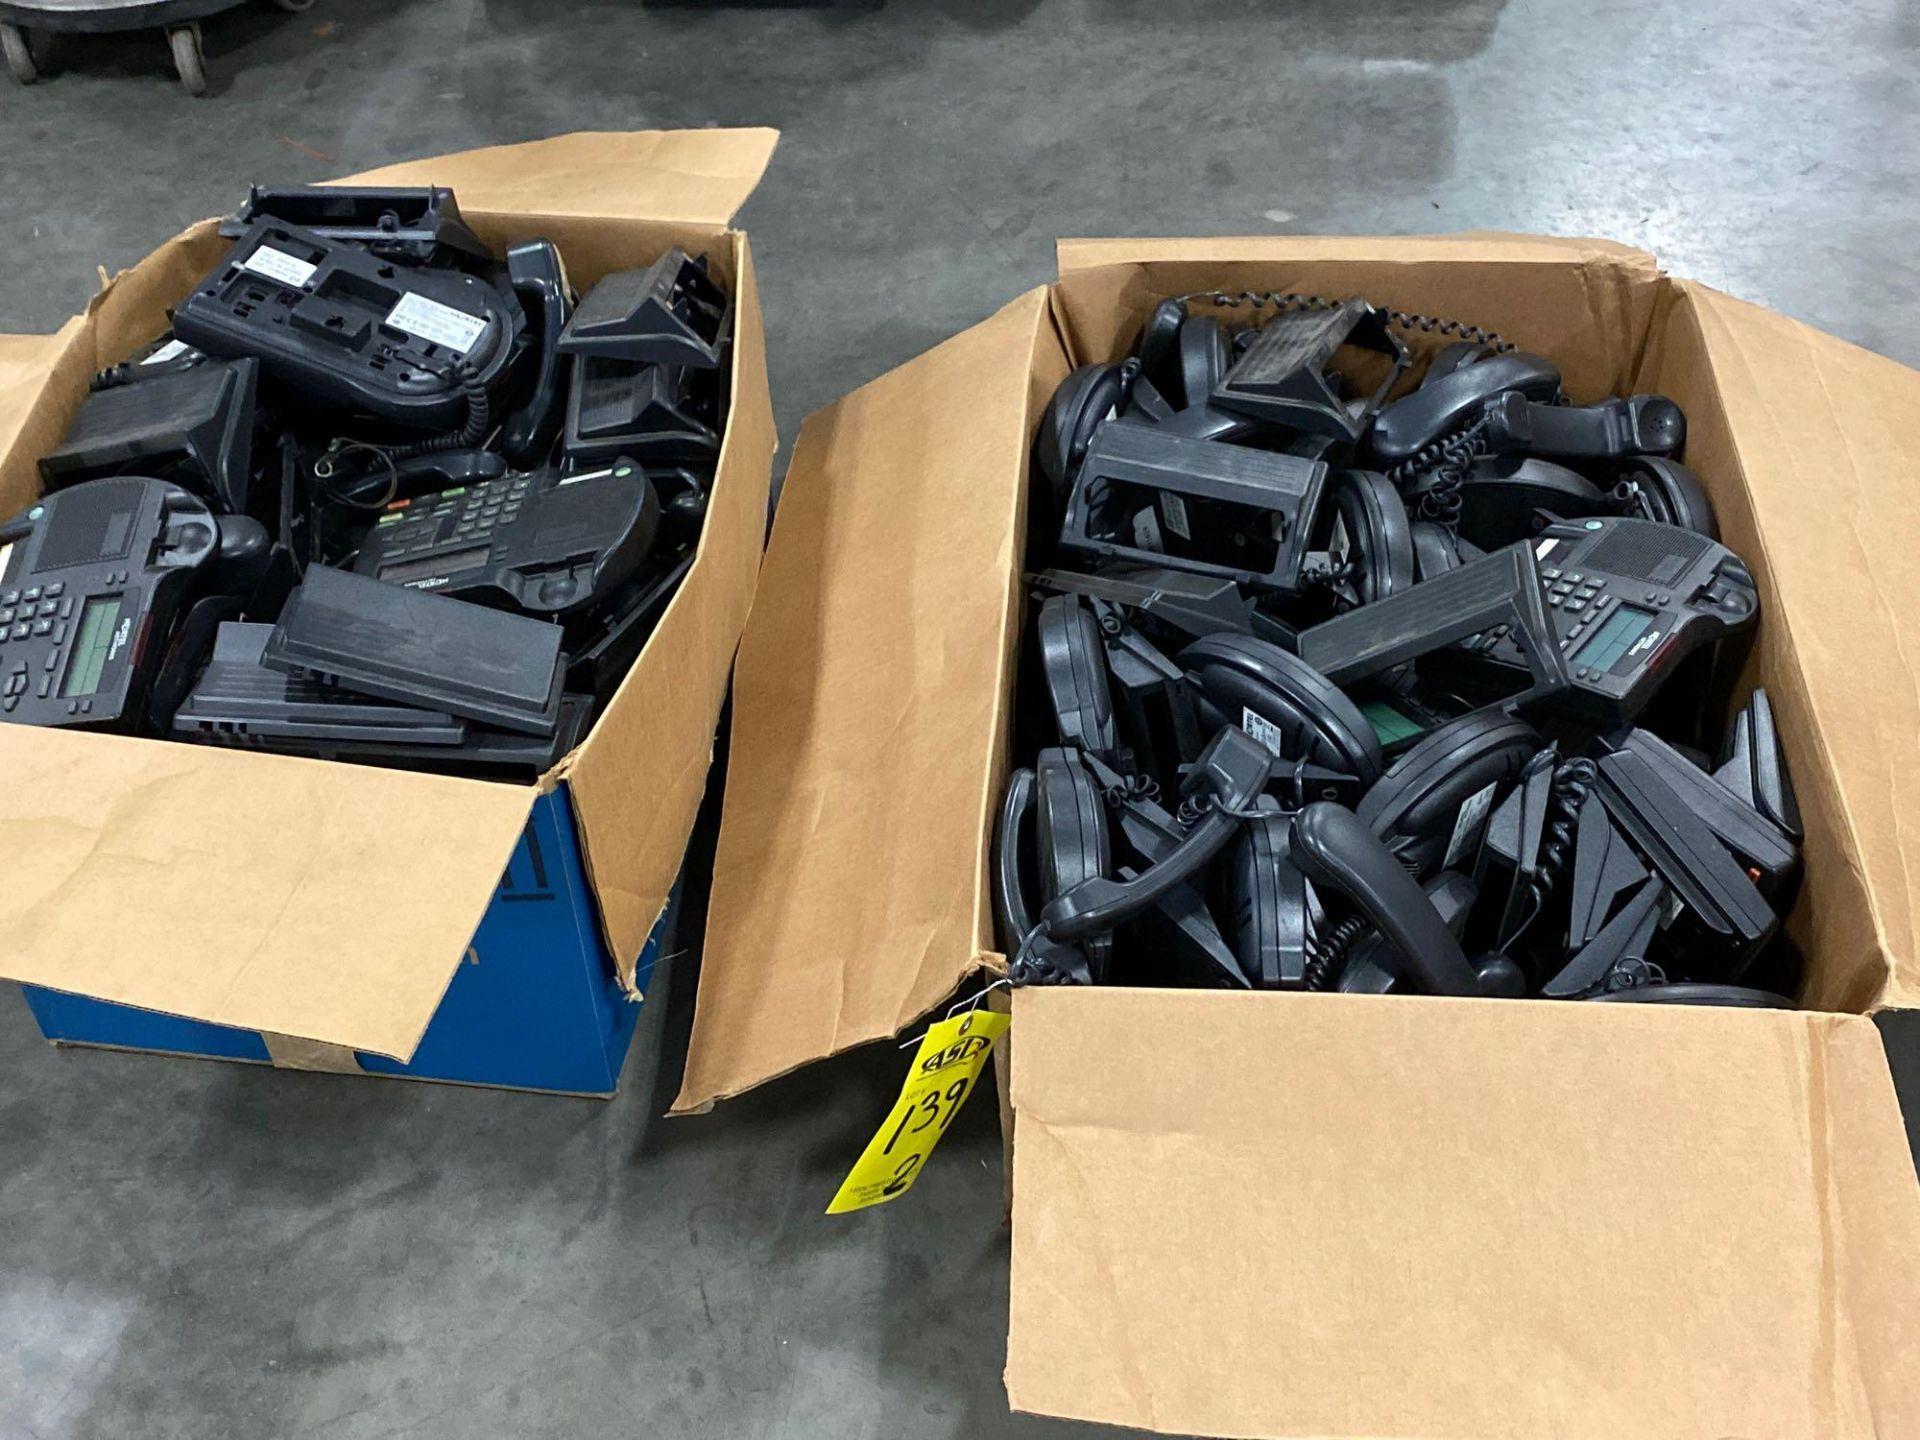 TWO BOXES OF CISCO IP PHONES